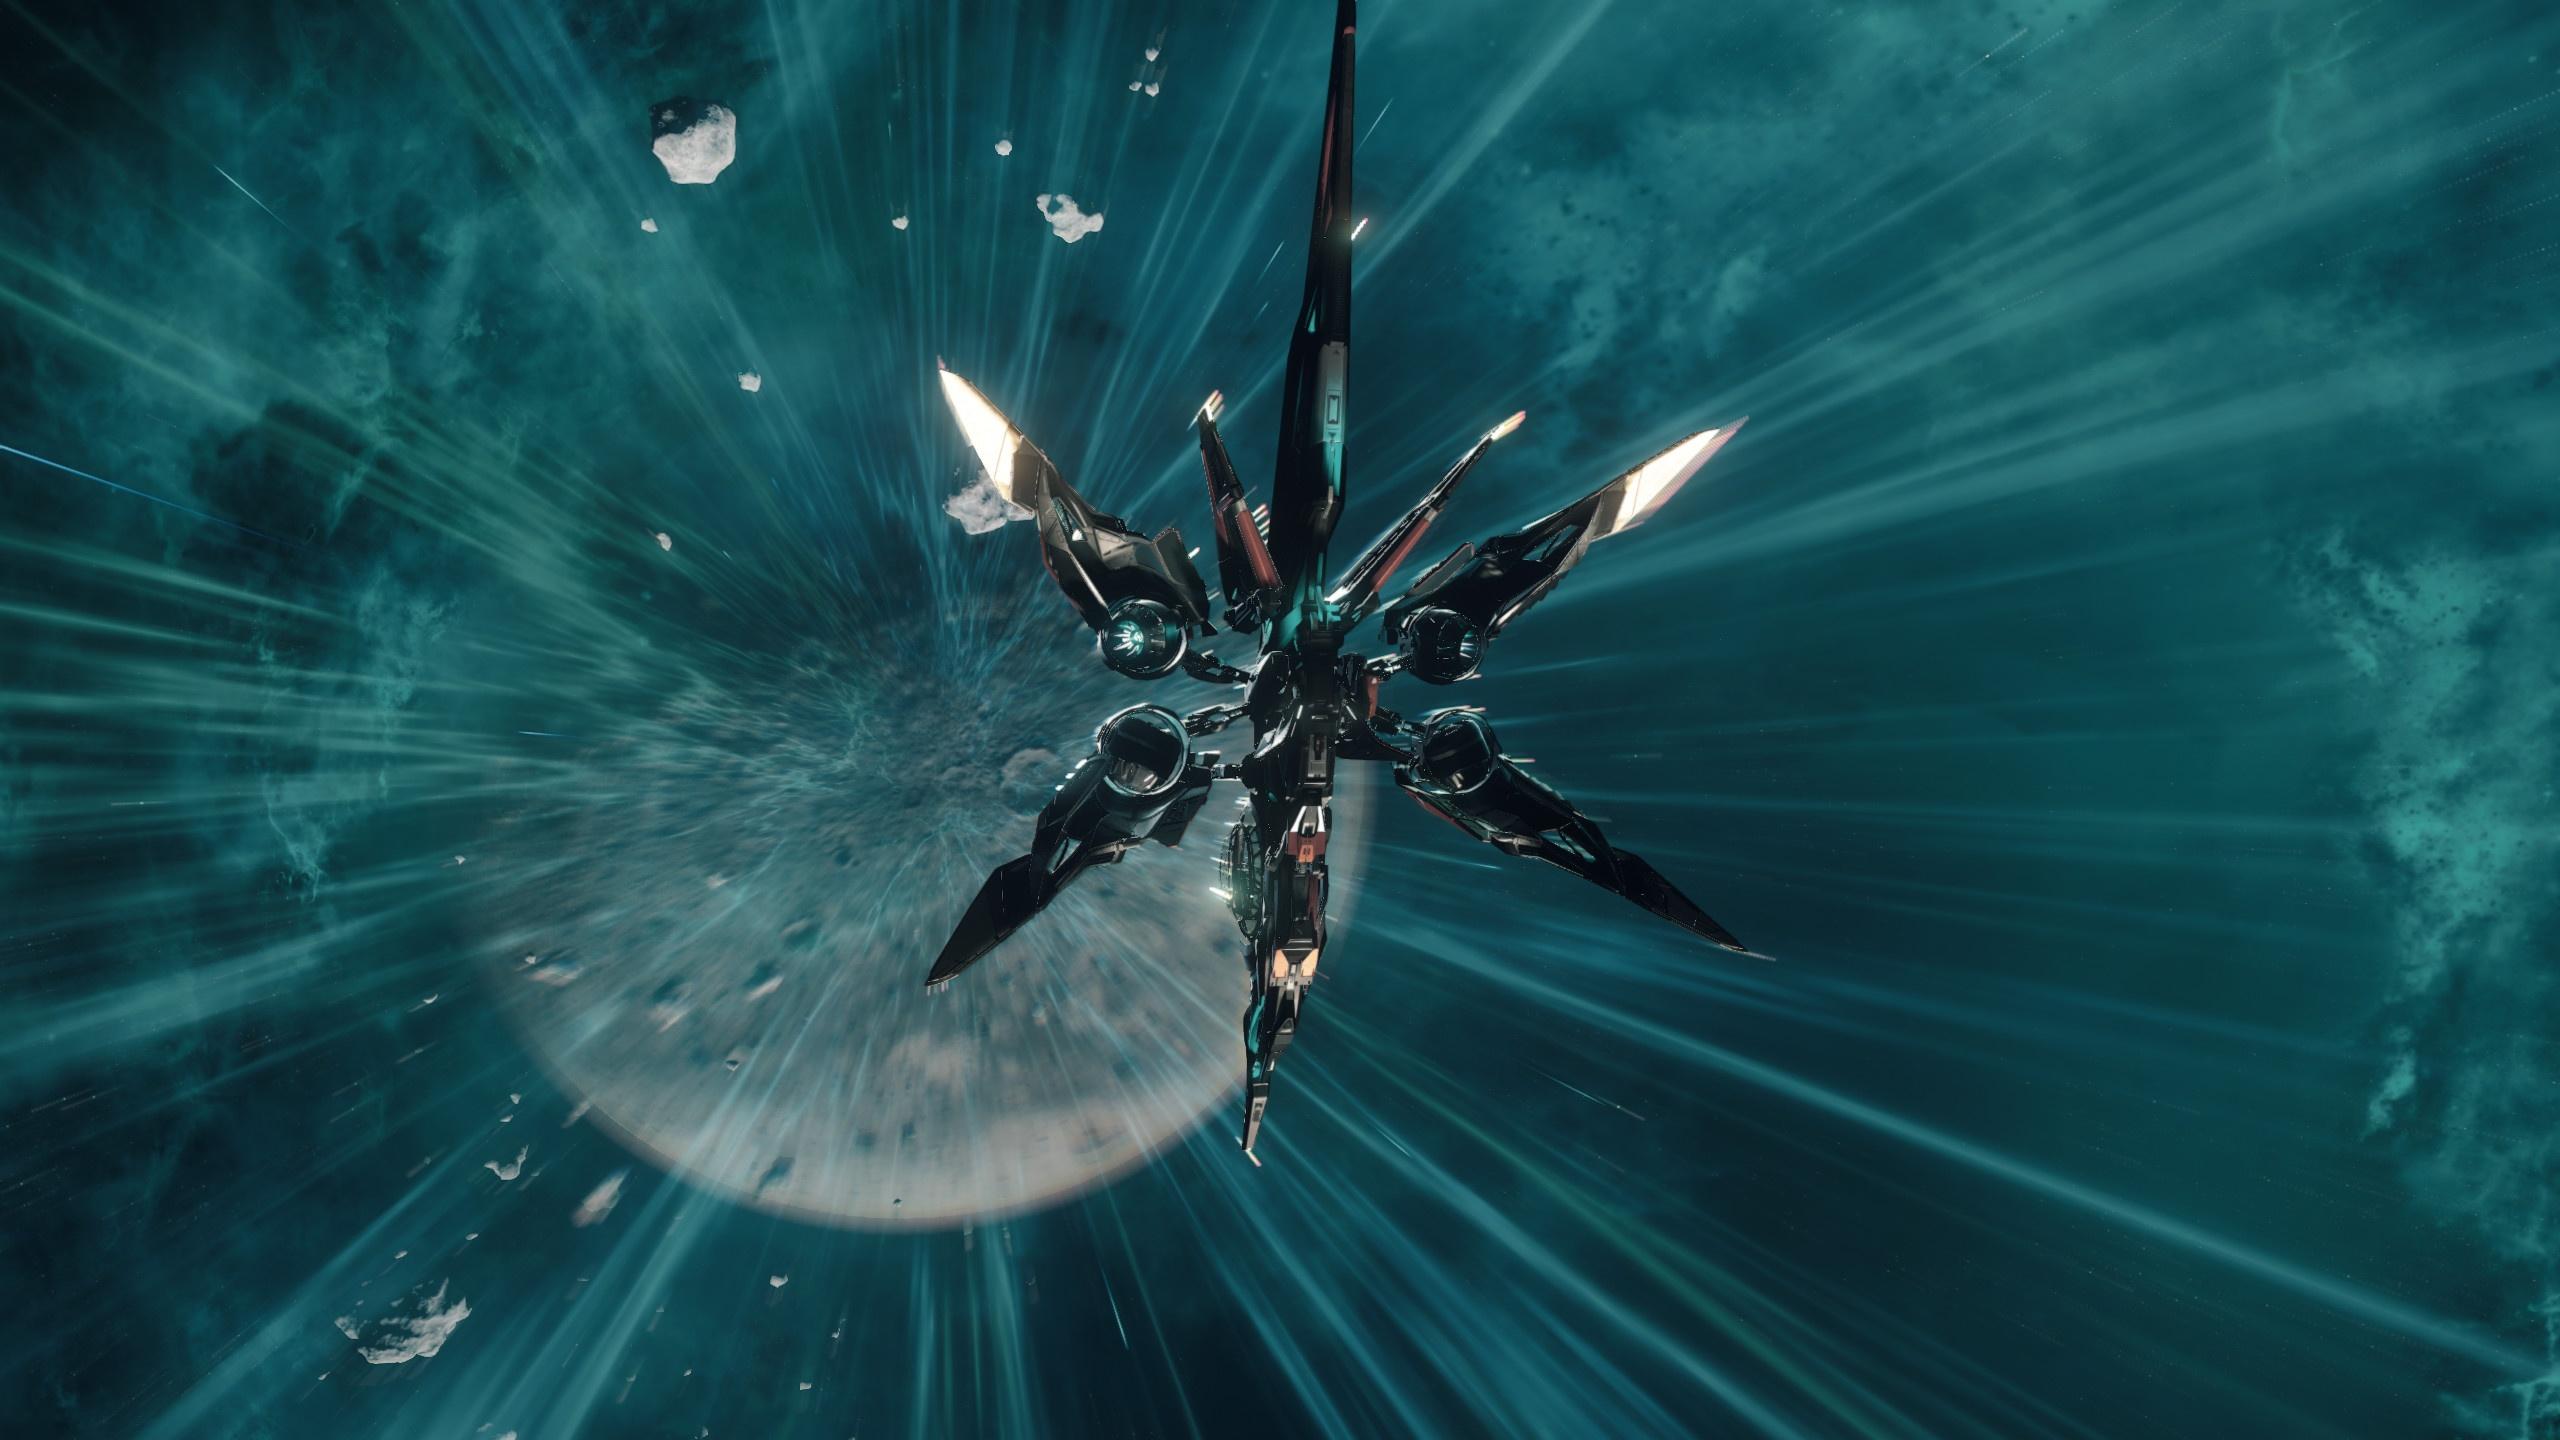 Starcraft 2 Wallpaper 4k